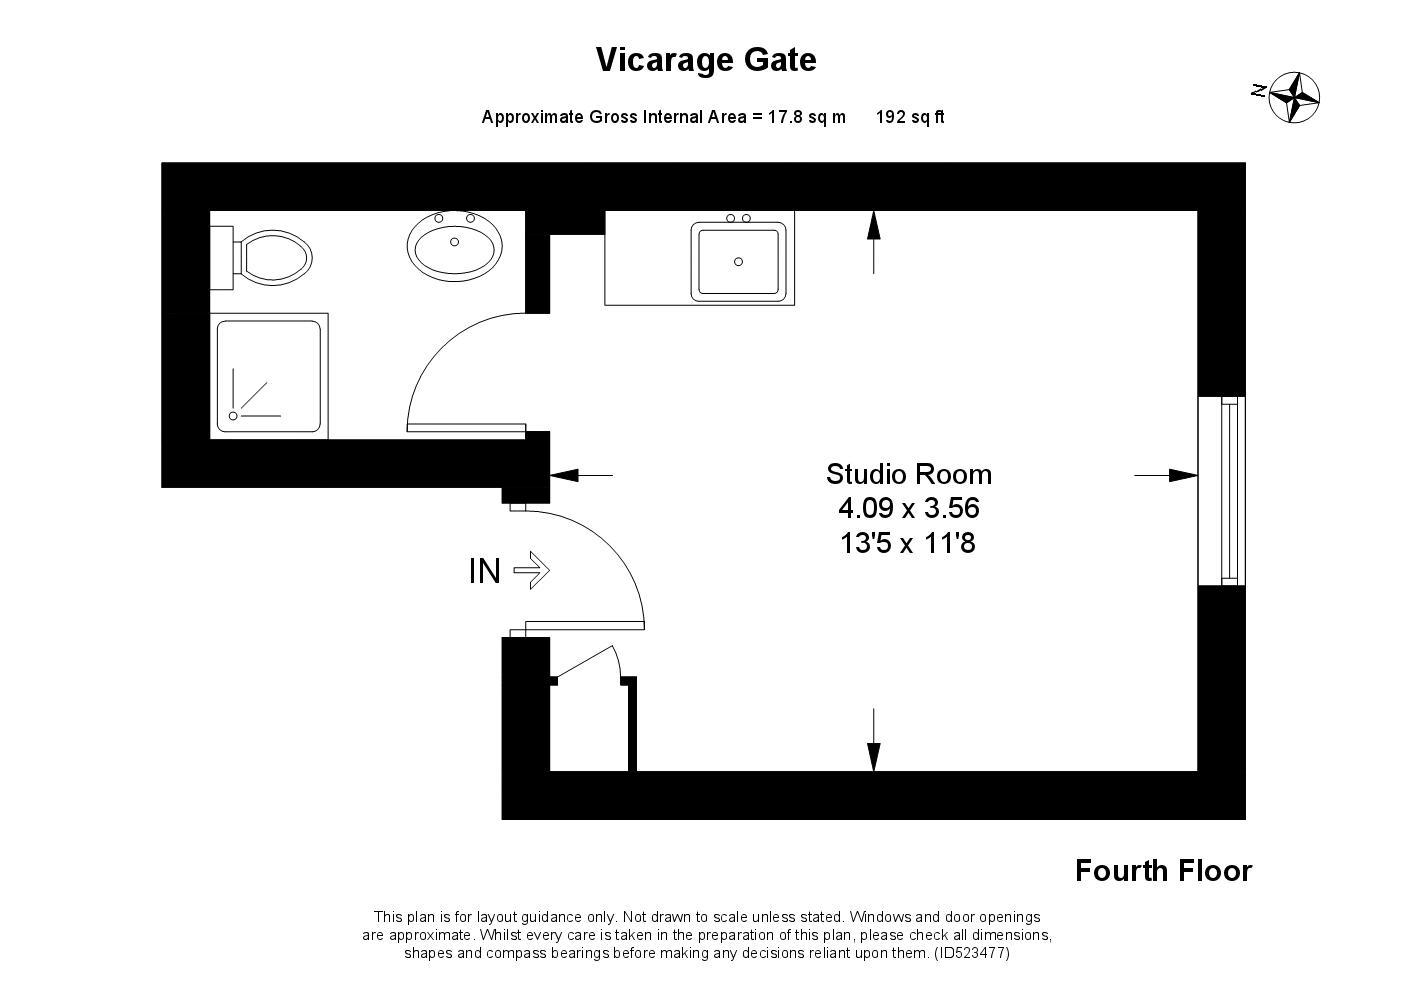 Vicarage Gate Kensington